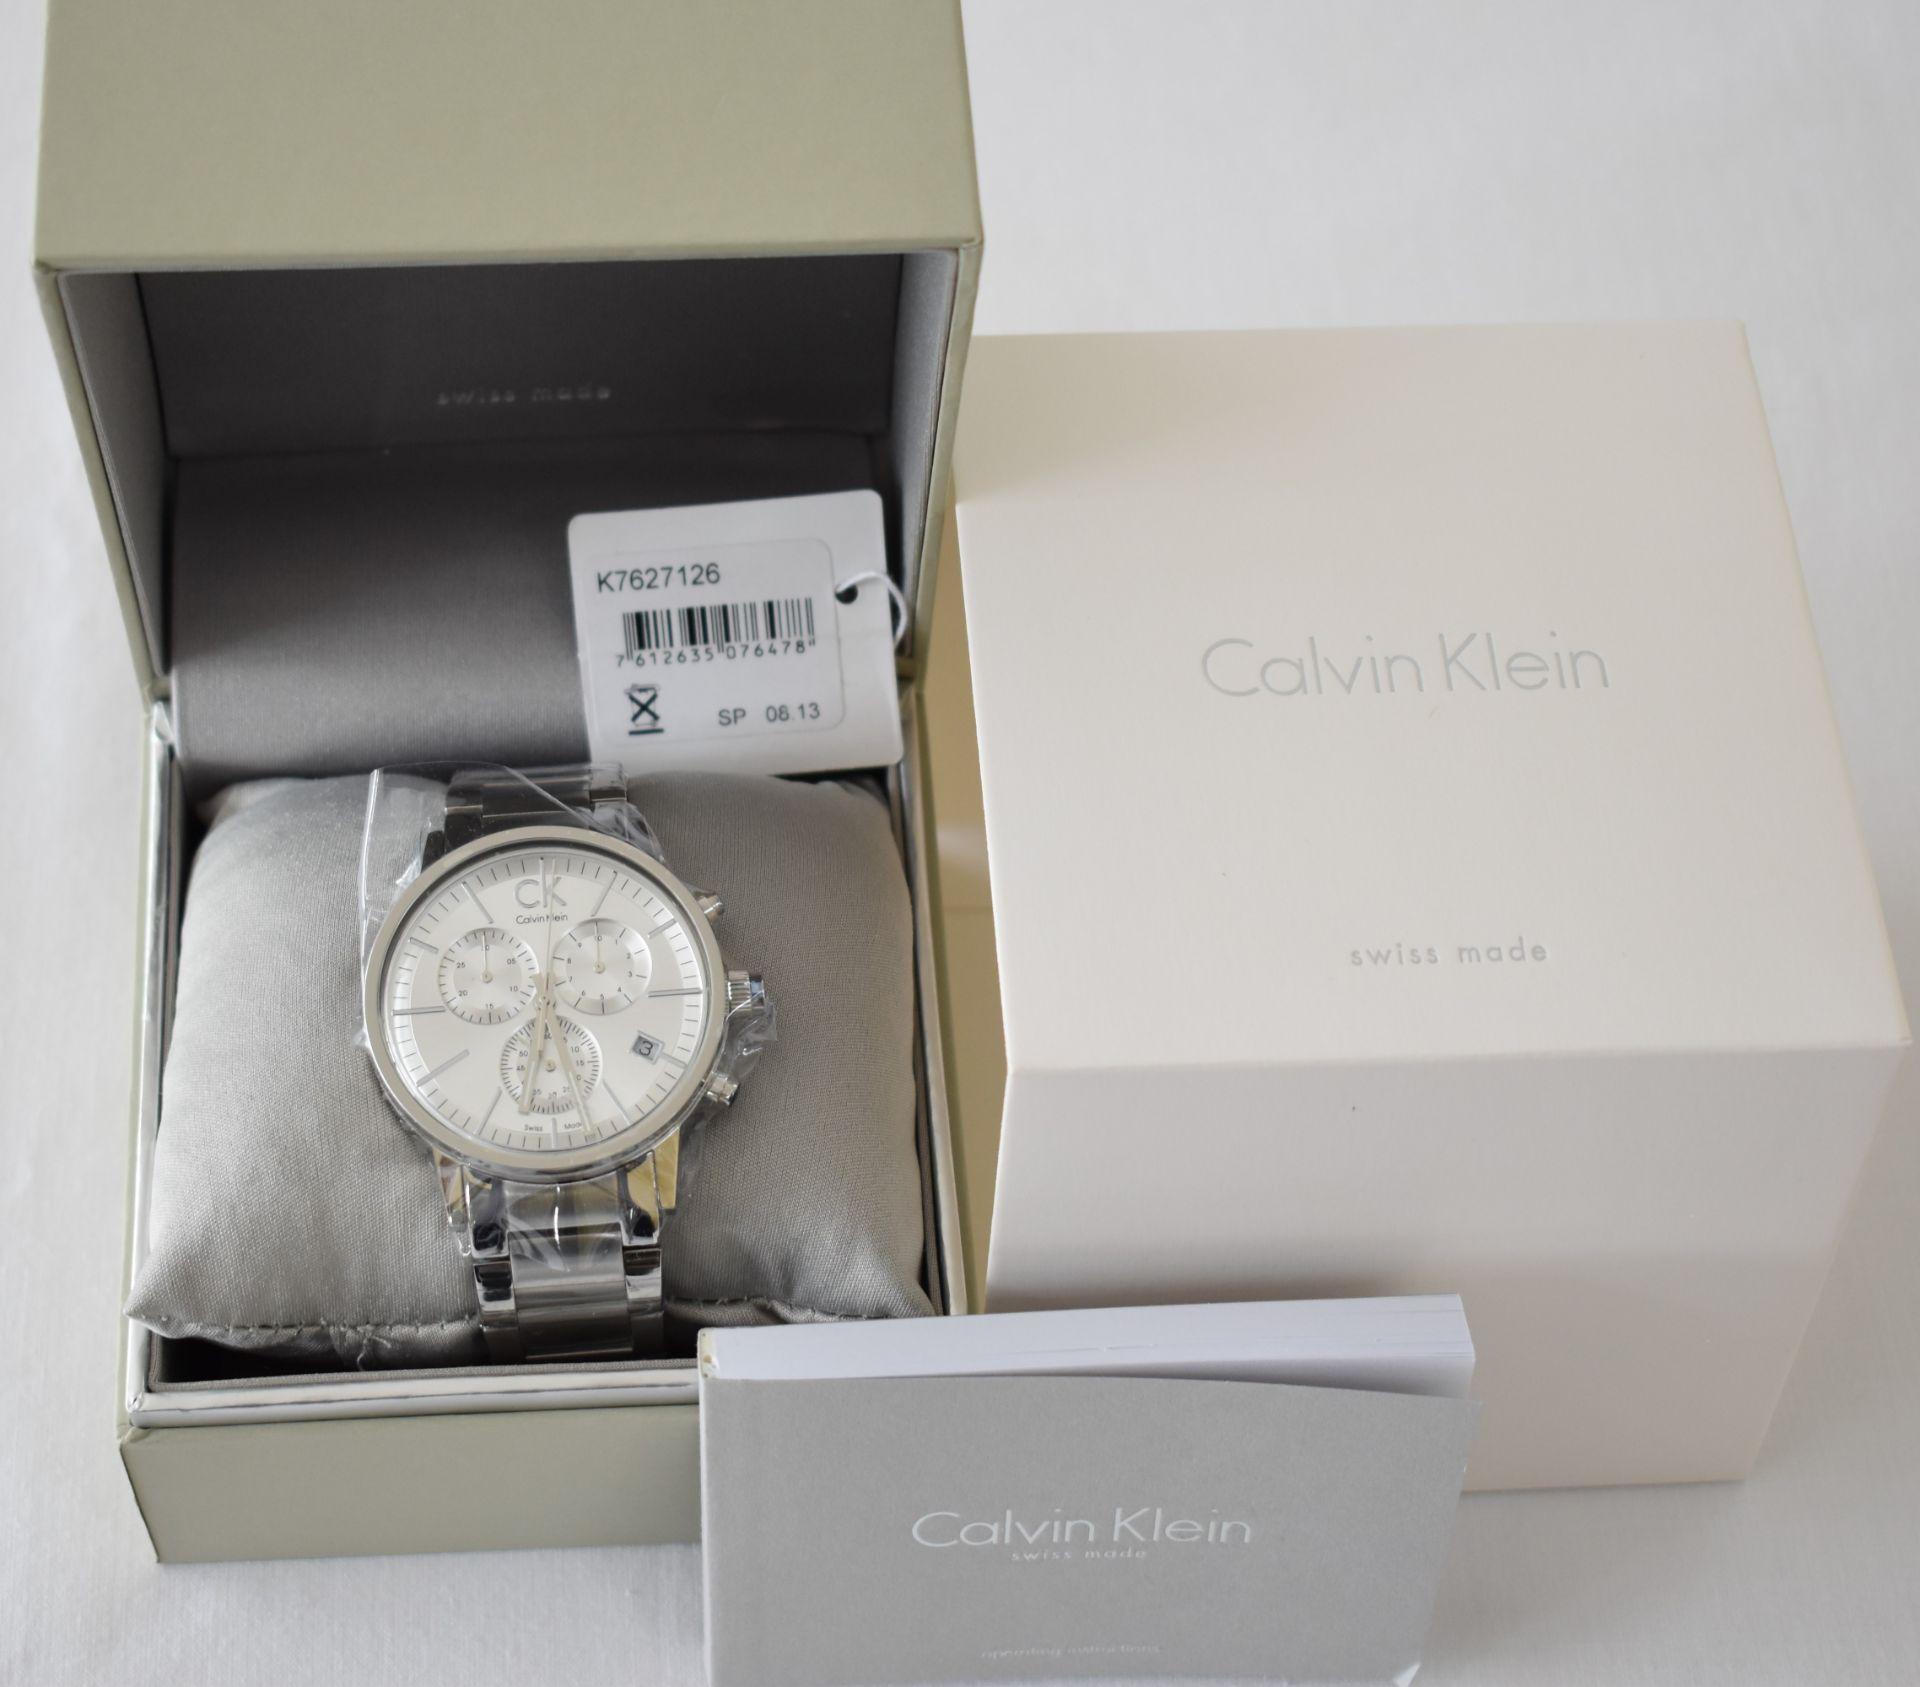 Calvin klein K7627126 Men's Watch - Image 2 of 2